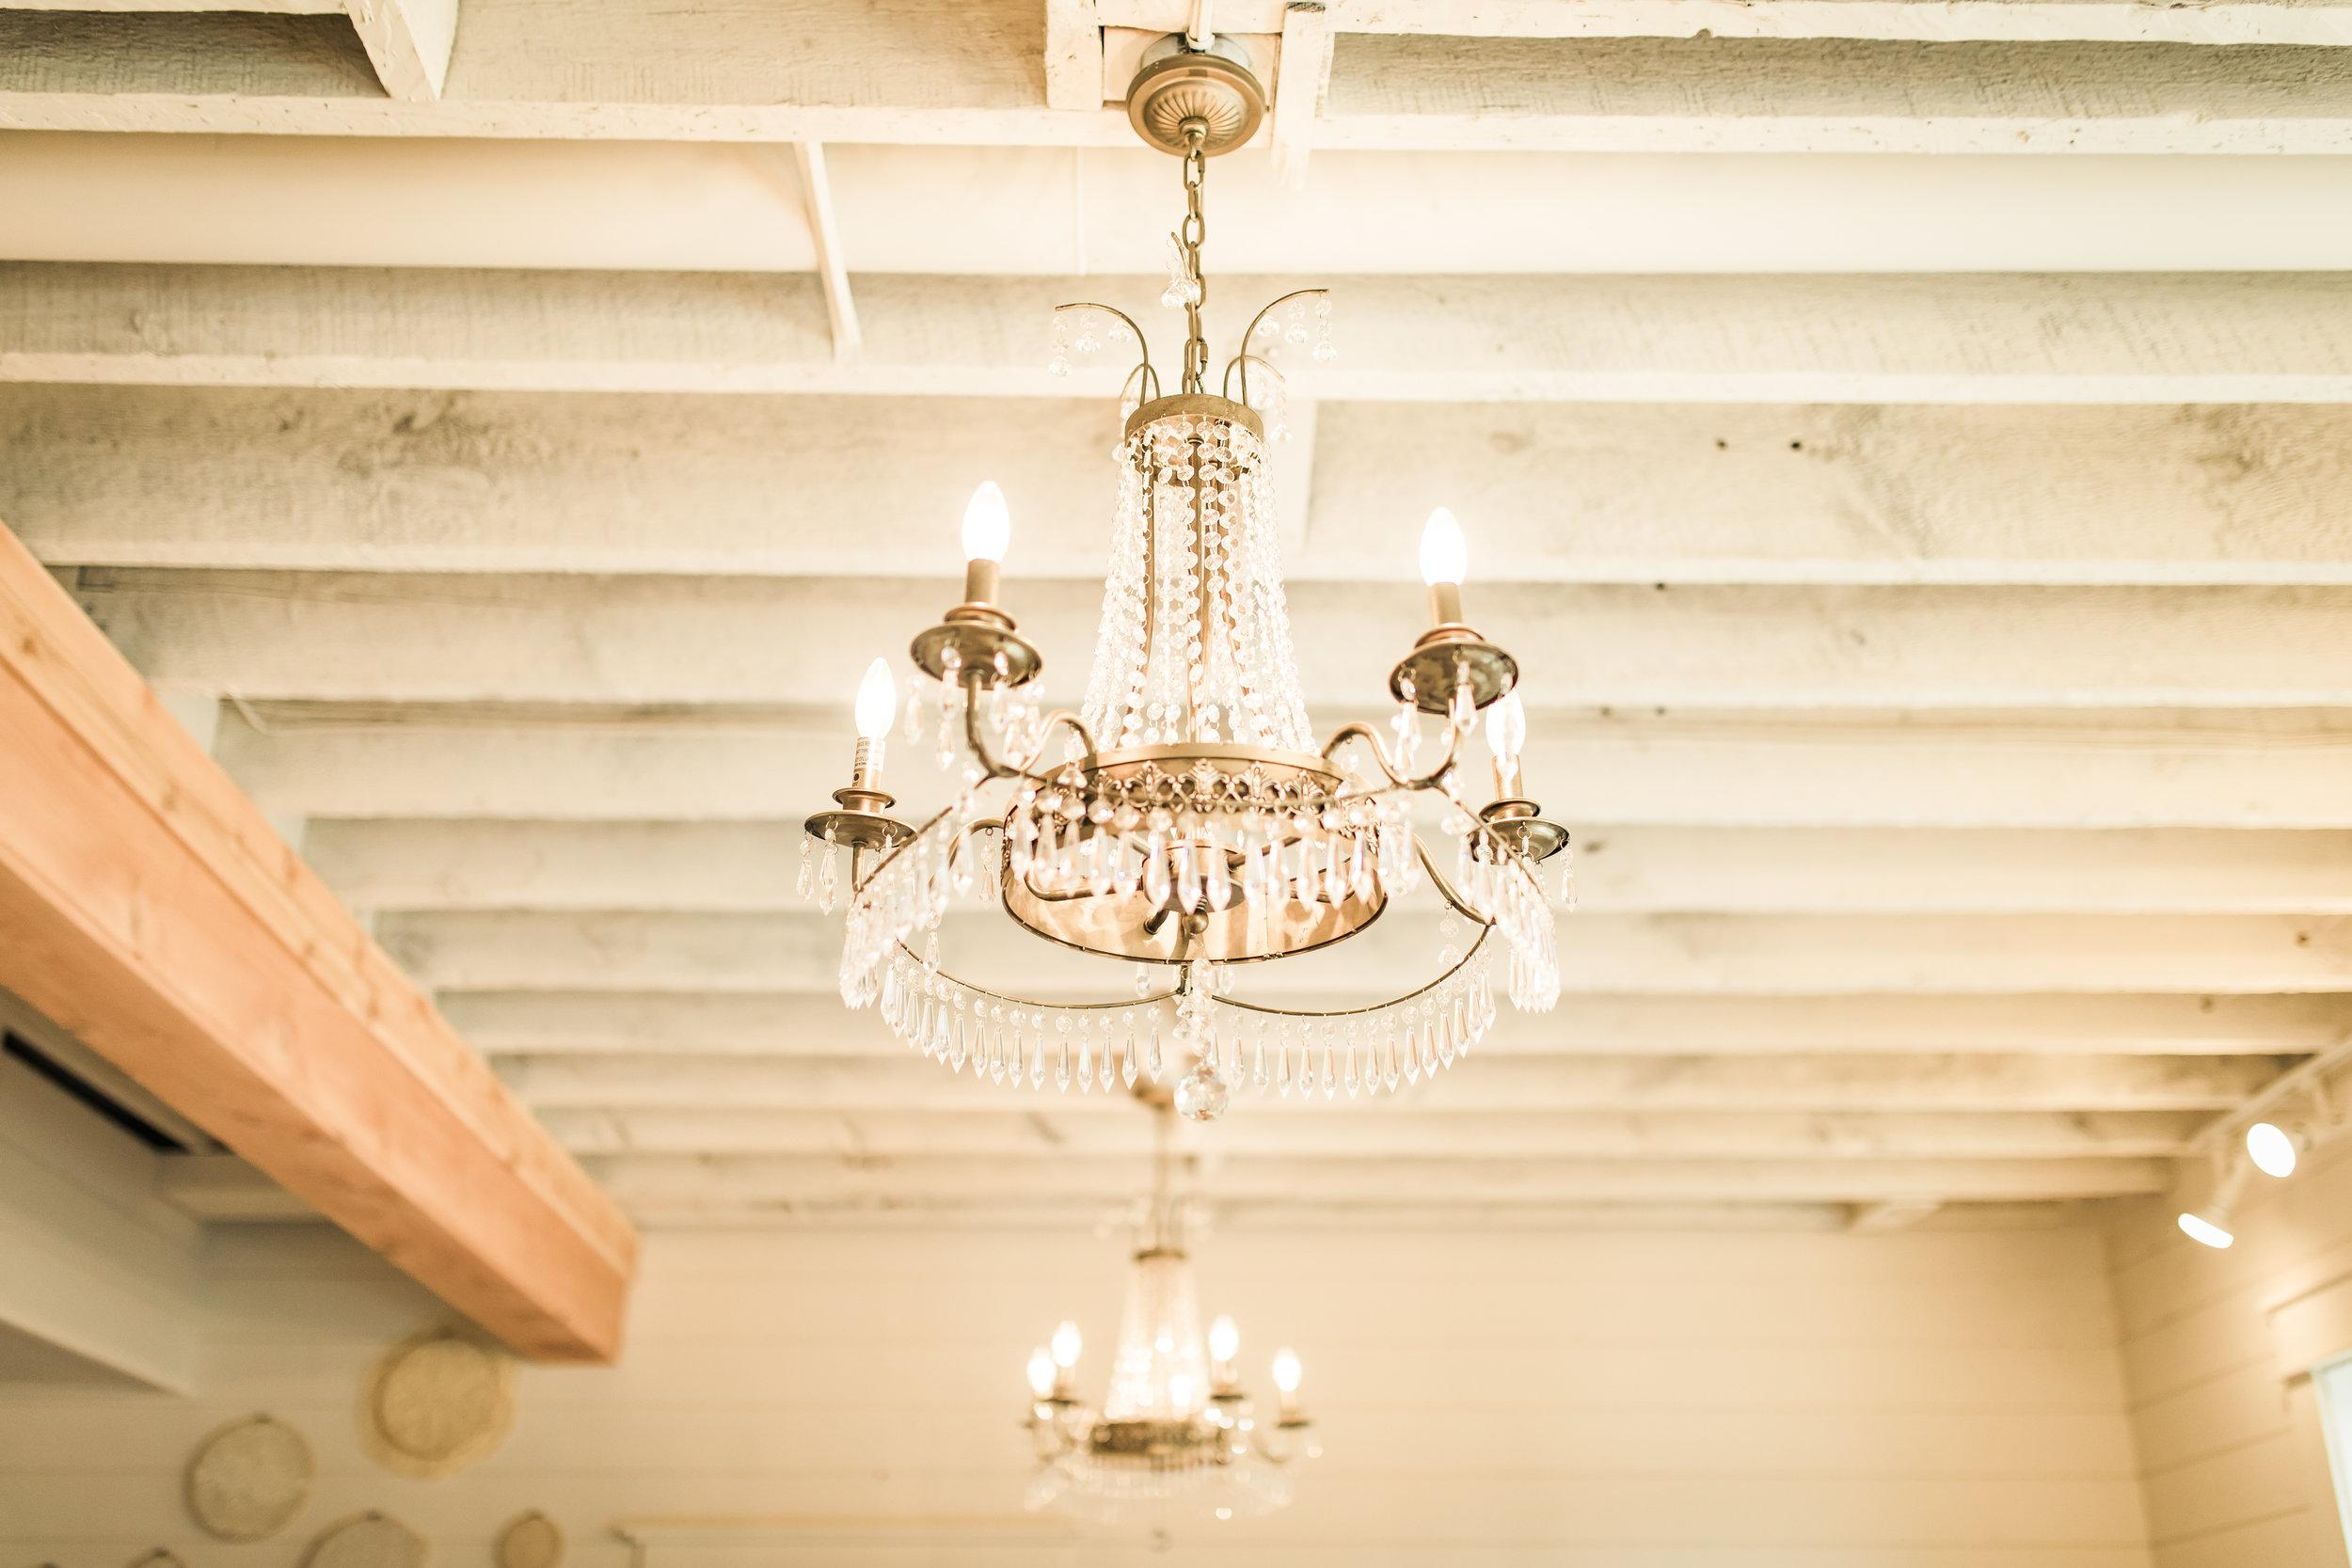 Cleo Bridal   White Traditions Sister-Store  O'Fallon, MO  Bridal Shop  Allison Slater Photography16.jpg